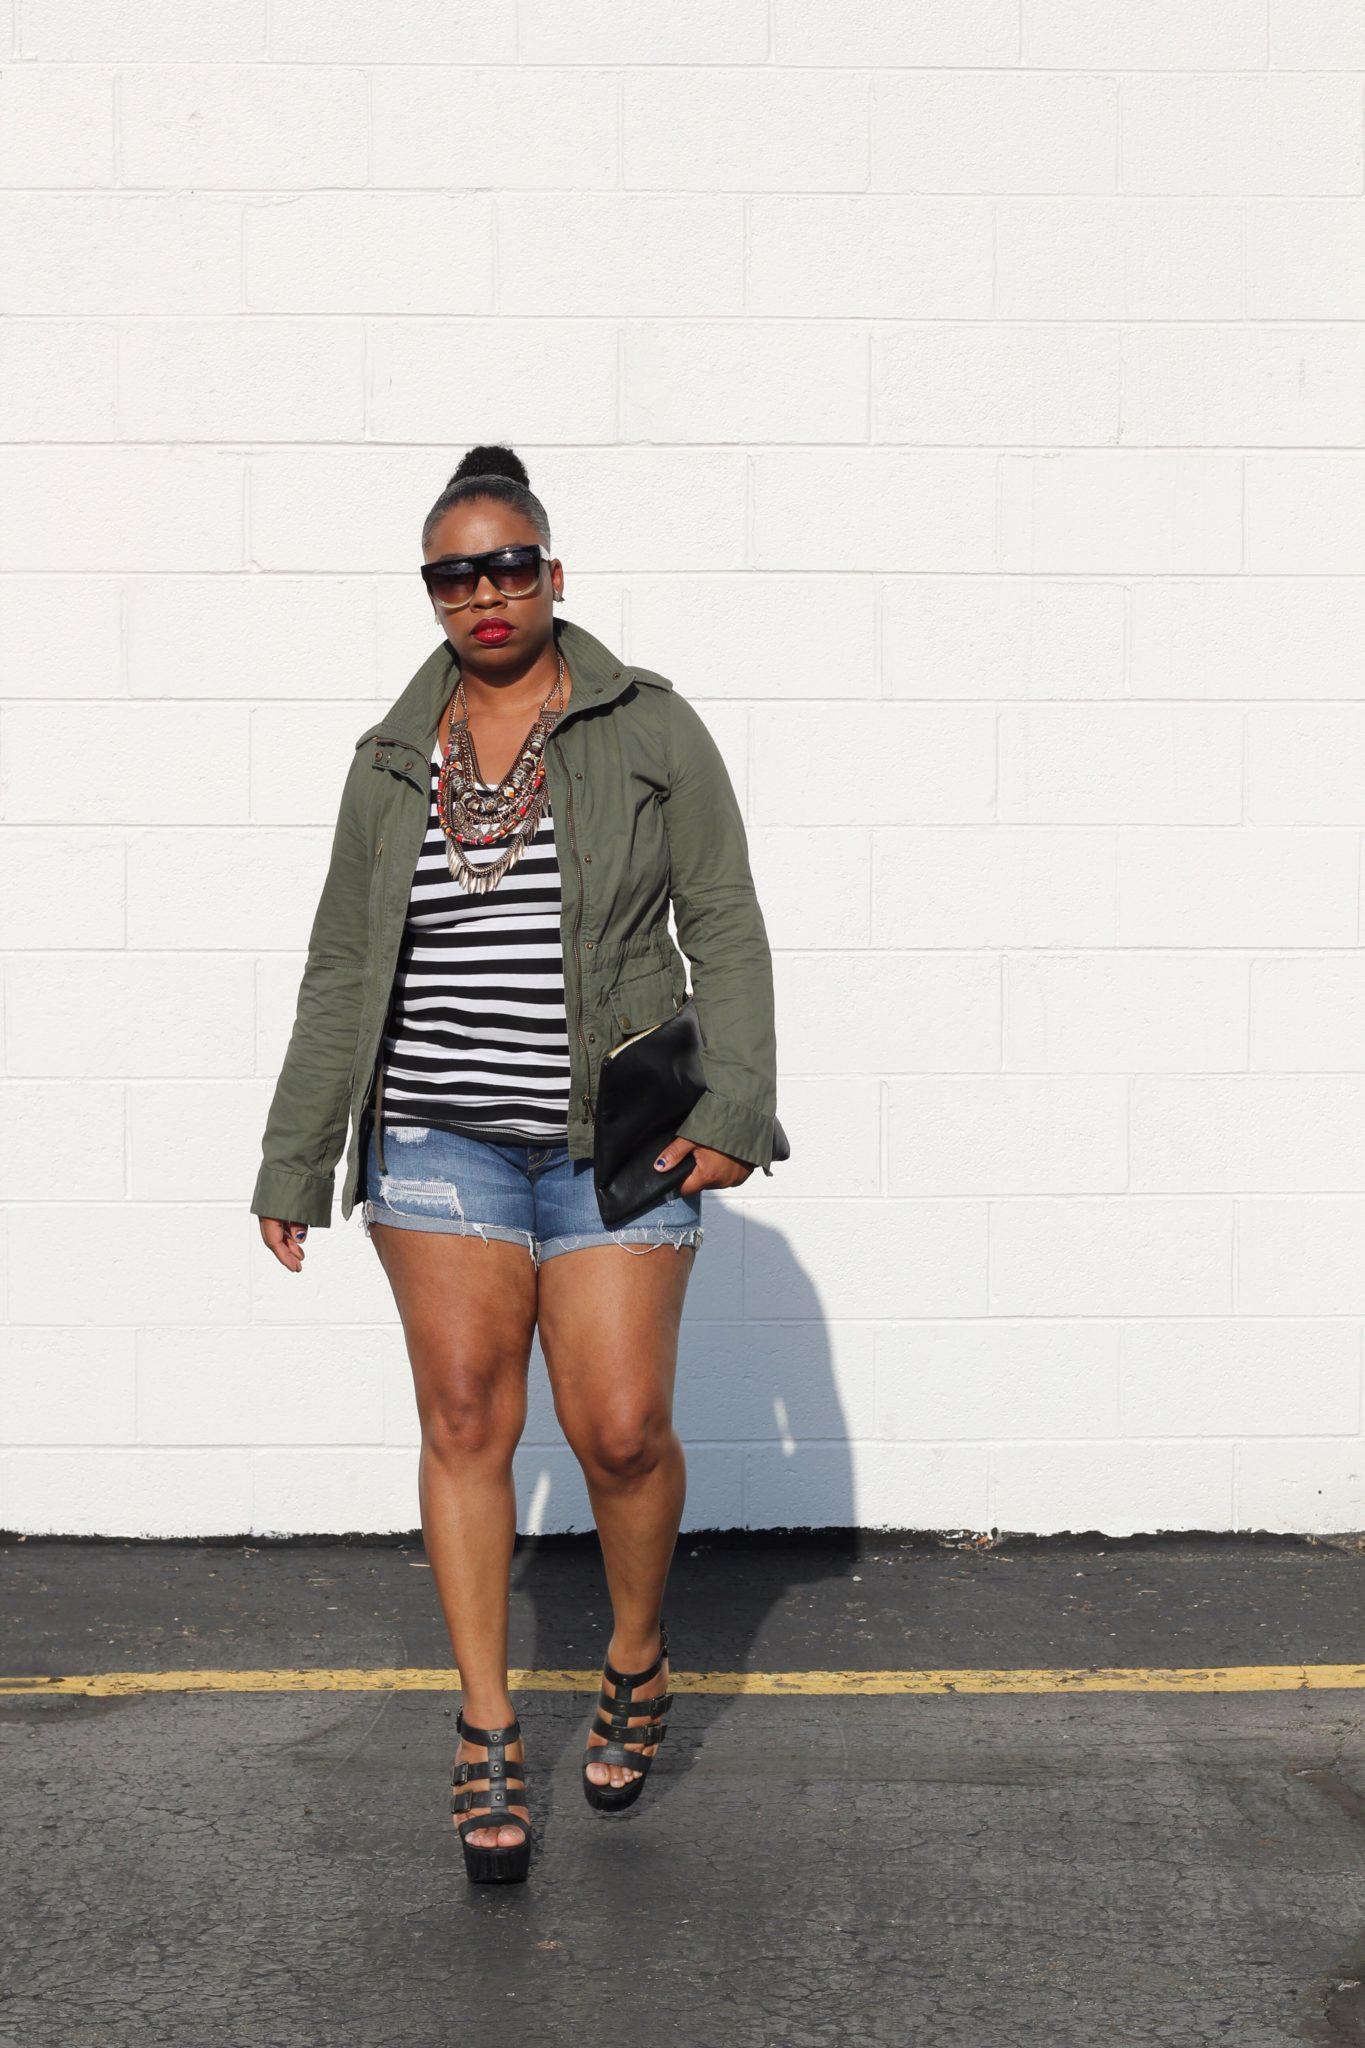 publish_snapshot-69 Hot Days & Cooler NightsAldo Shoes American Apparel eBay Fashion Fashion Nova how to Jessica Simpson Shoes OOTD shopping Style How To's: Style Inspiration Stylewatch Styling Target Target Style Uncategorized